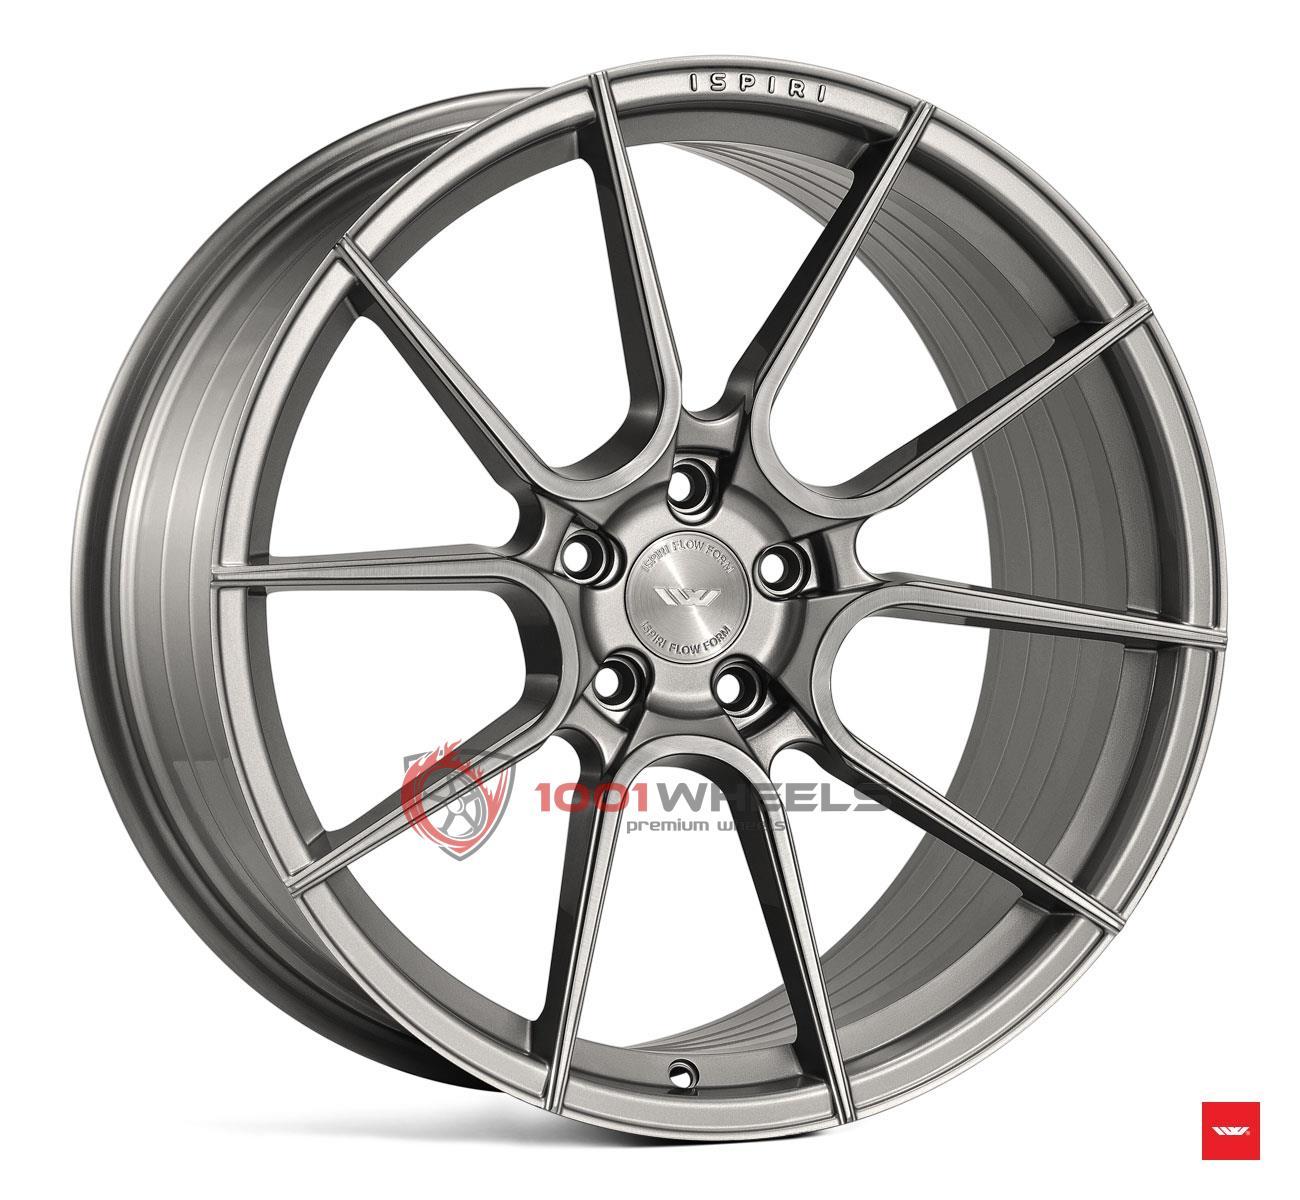 ISPIRI FFR6 carbon-grey-brushed